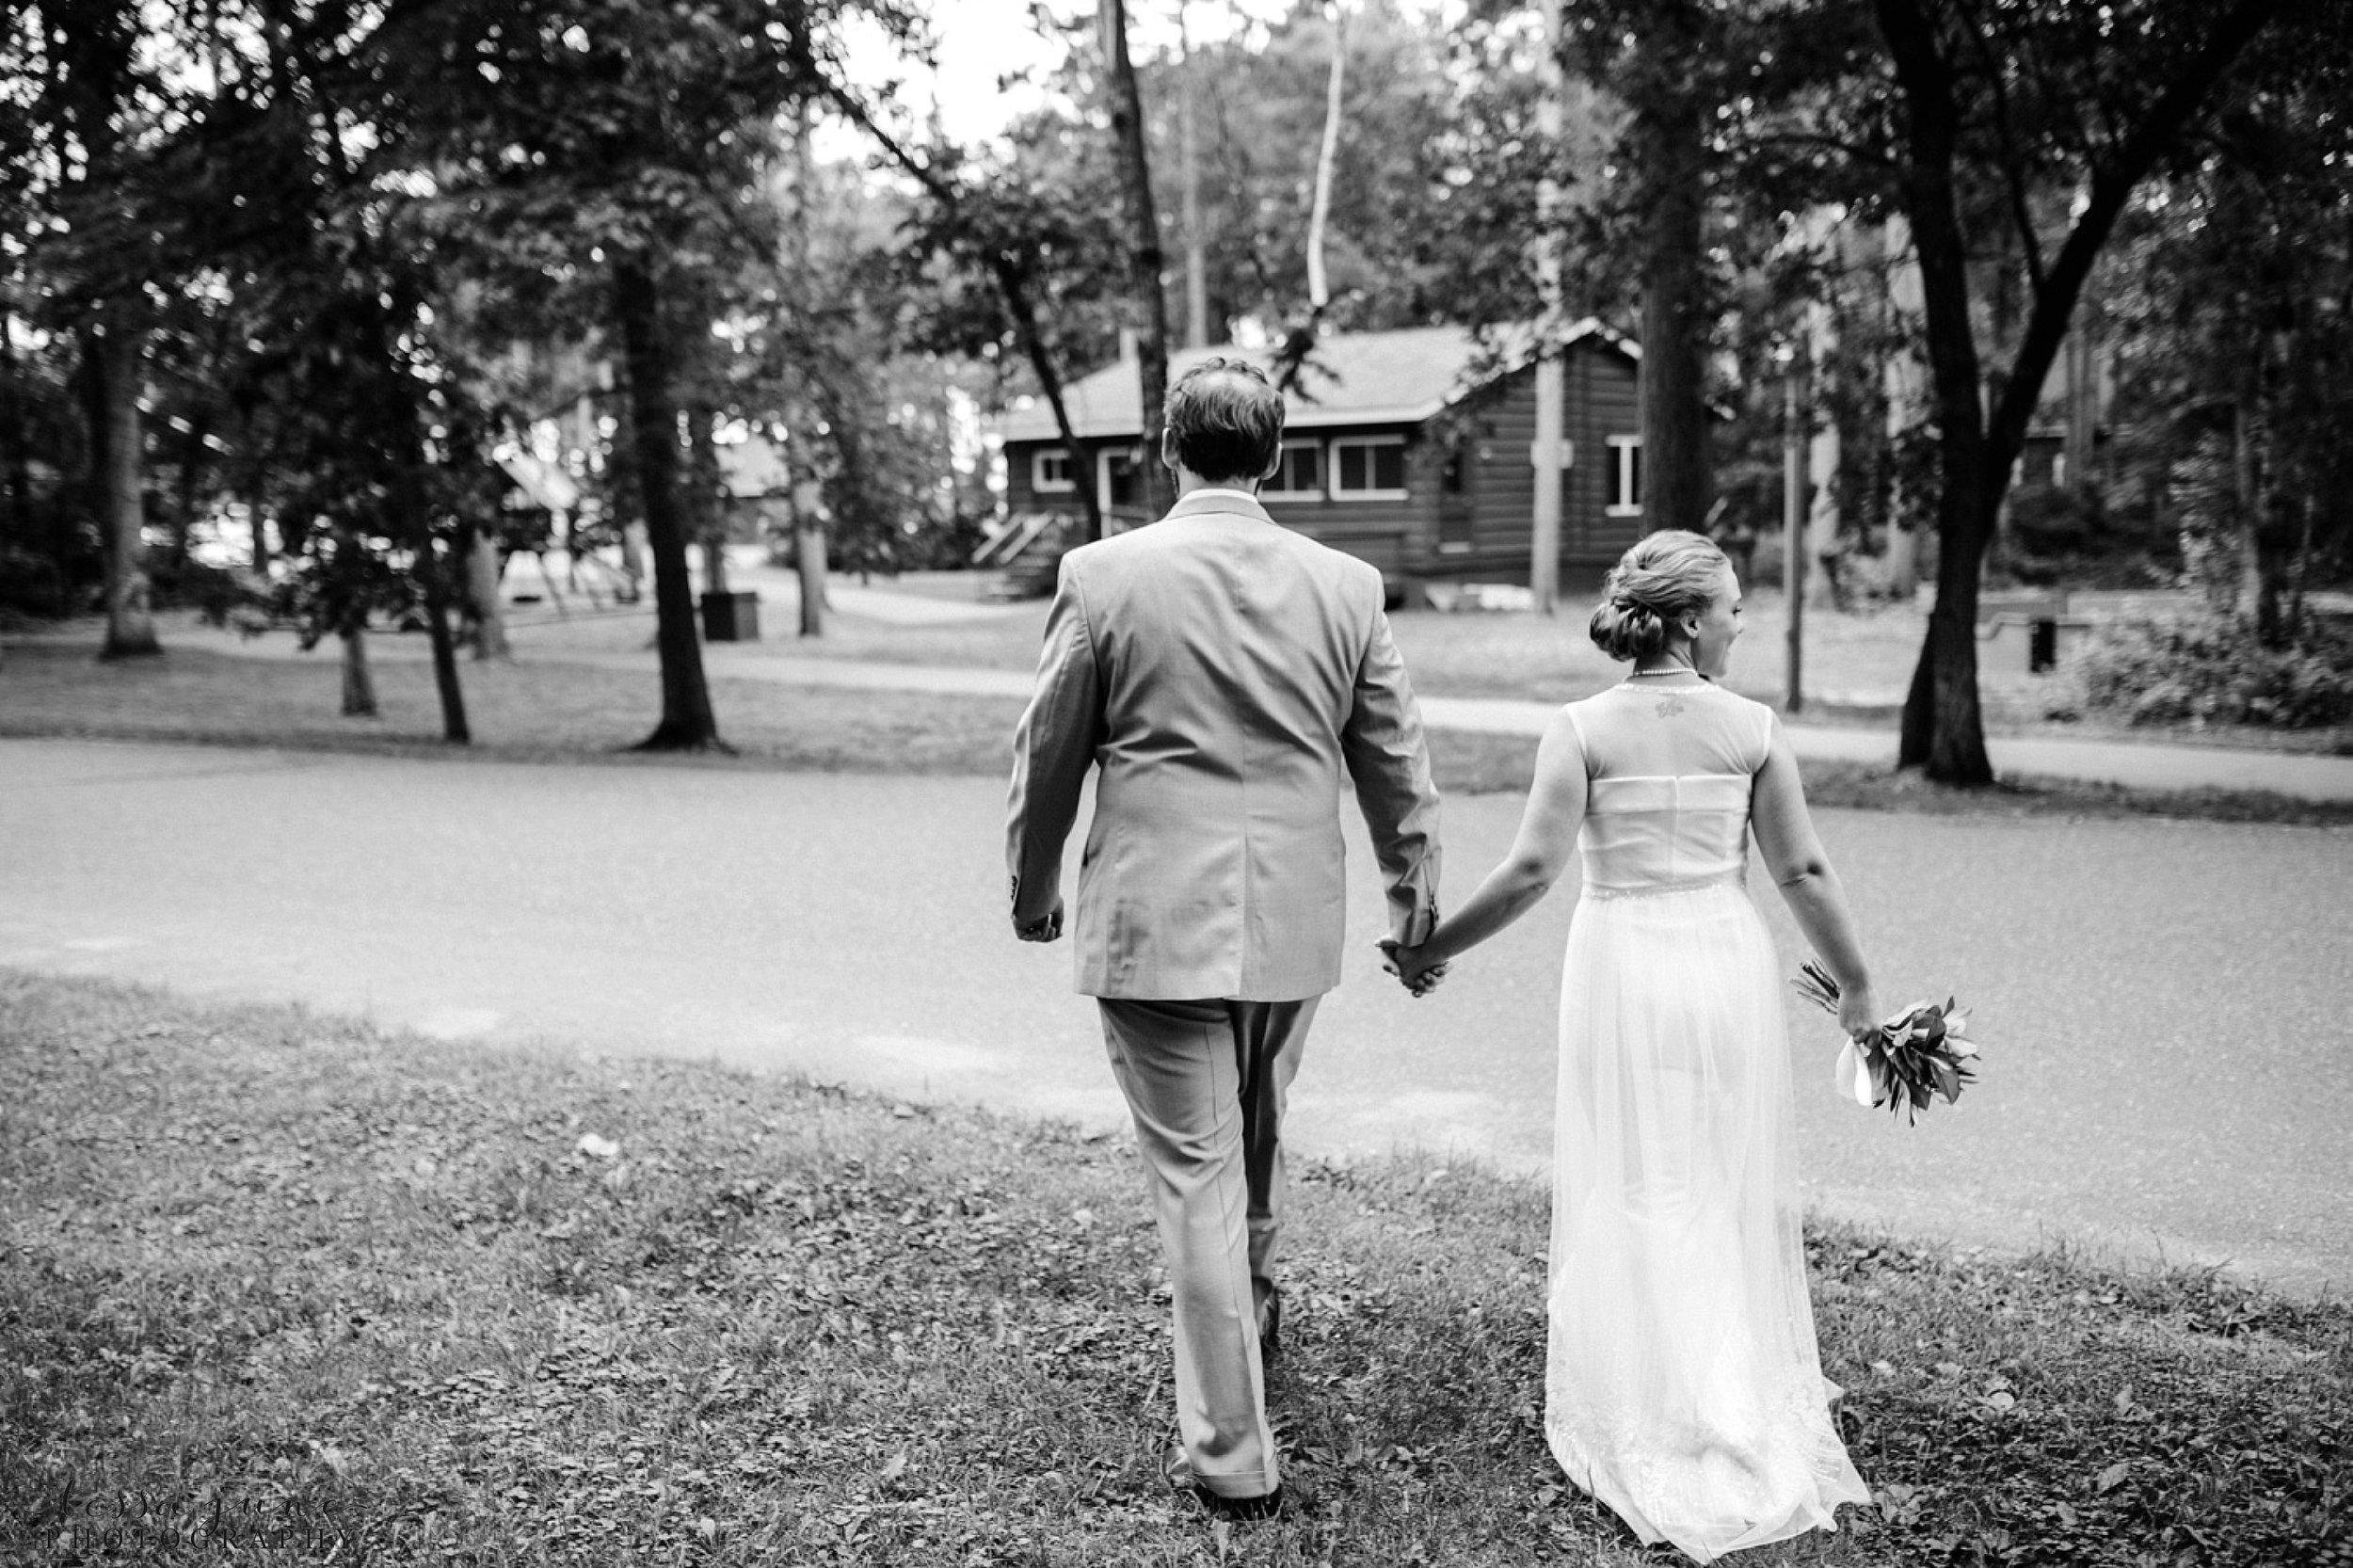 grandview-lodge-intimate-wedding-nisswa-minnesota_0038.jpg